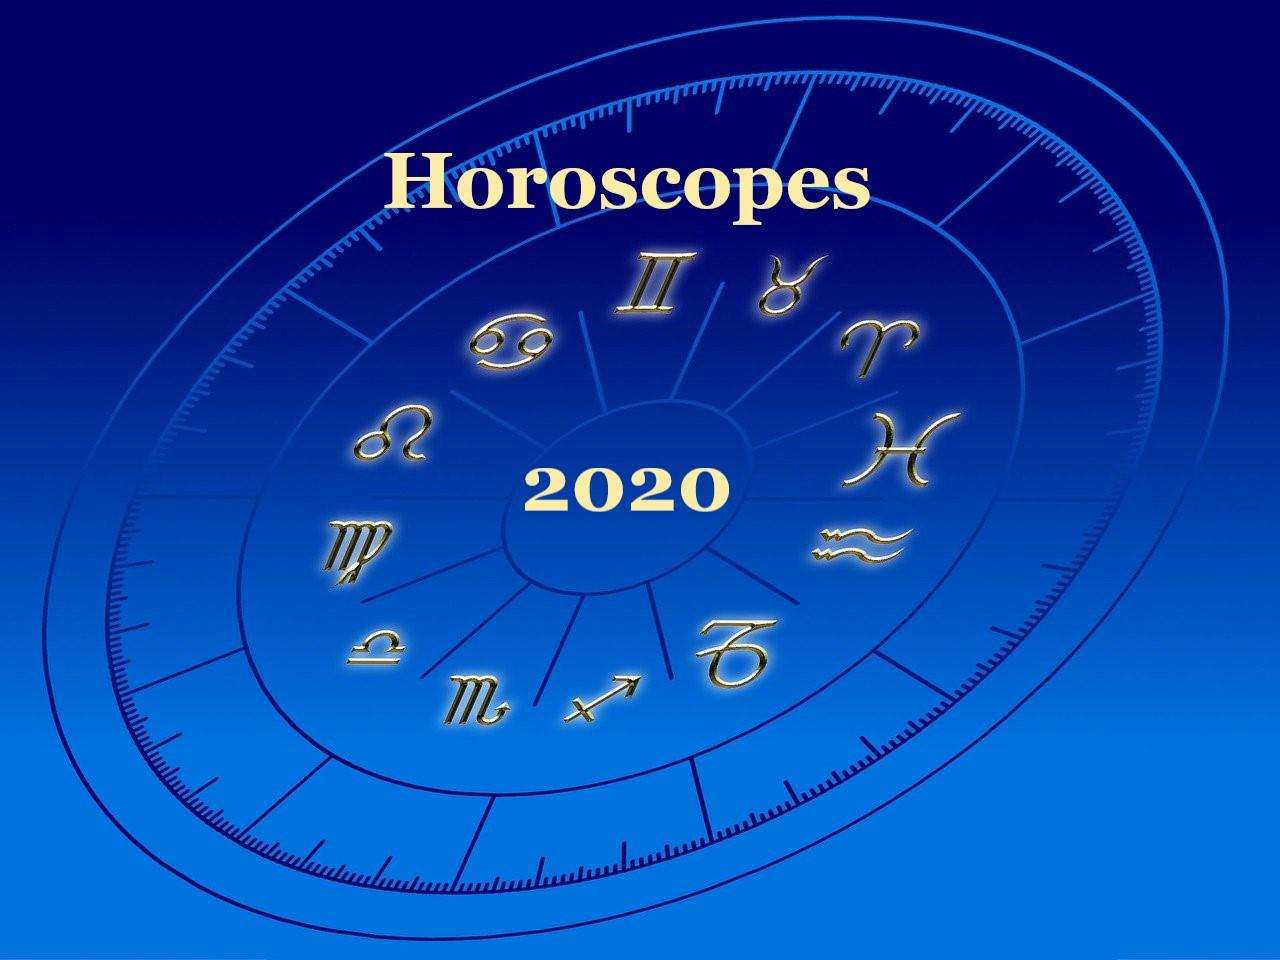 Votre horoscope 2020